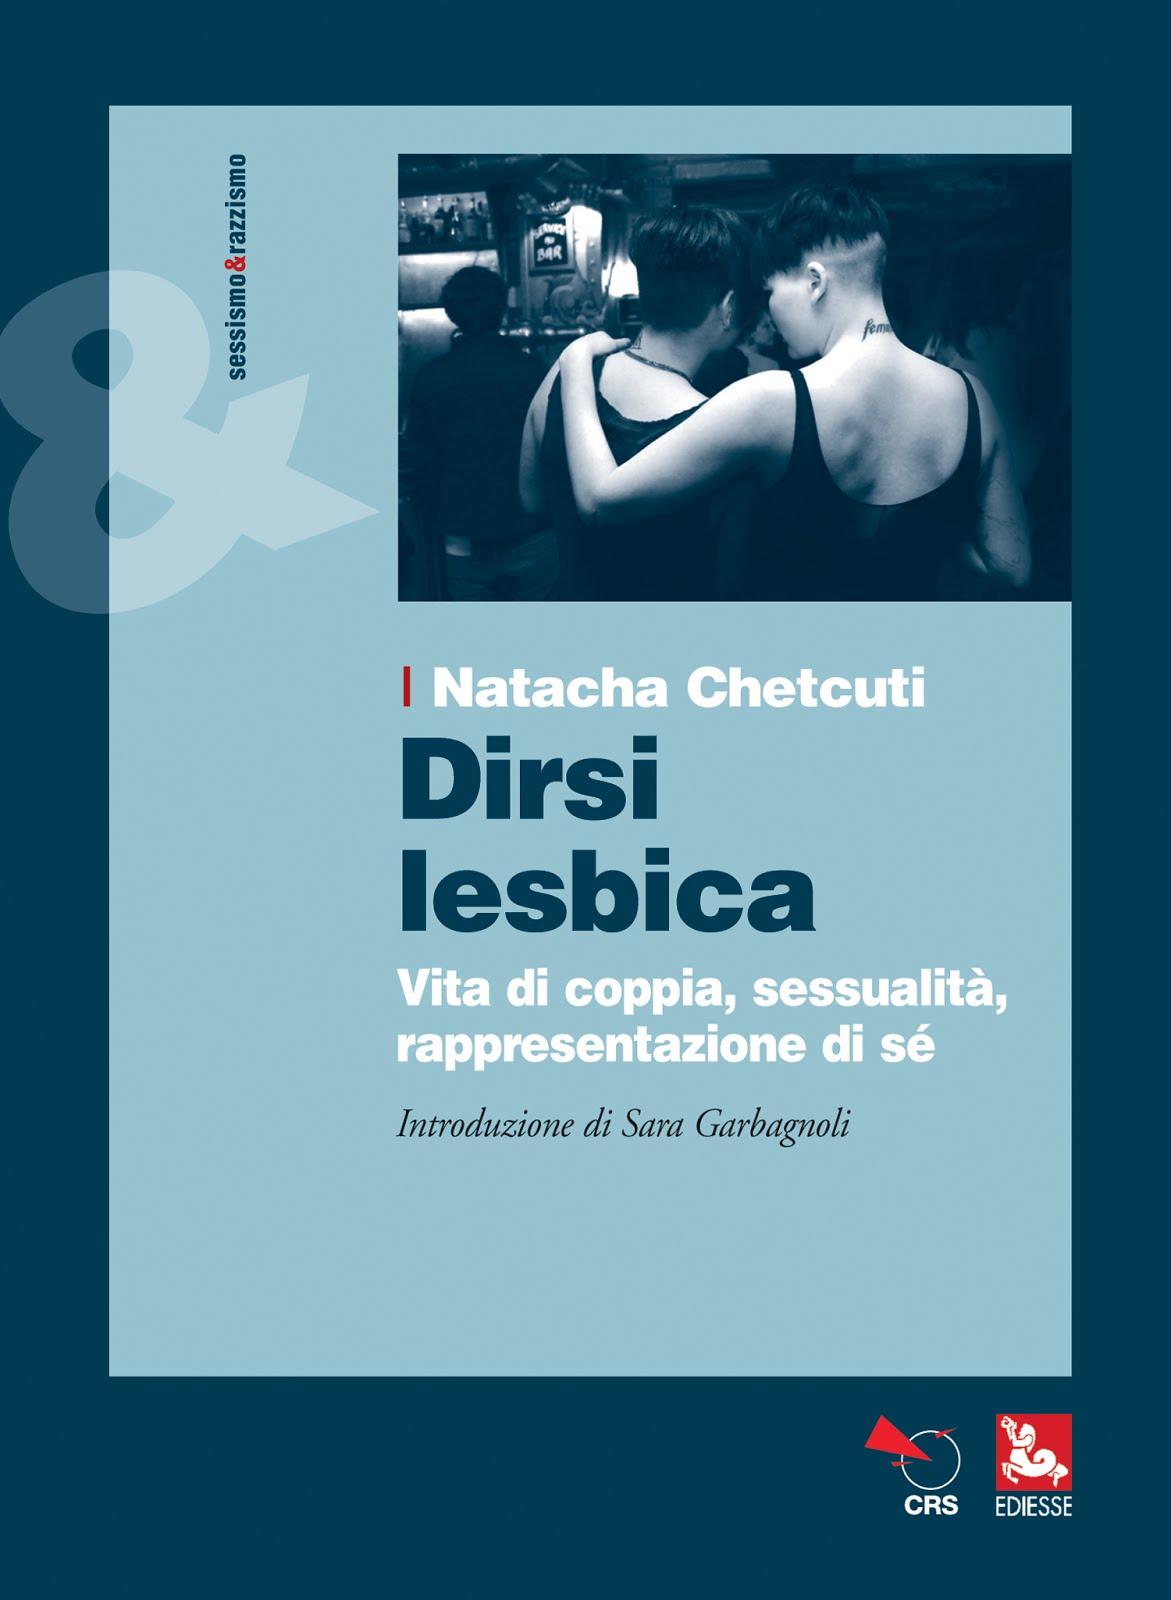 """Dirsi lesbica. Vita di coppia, sessualità, rappresentazione di sé"" di Natacha Chetcuti"